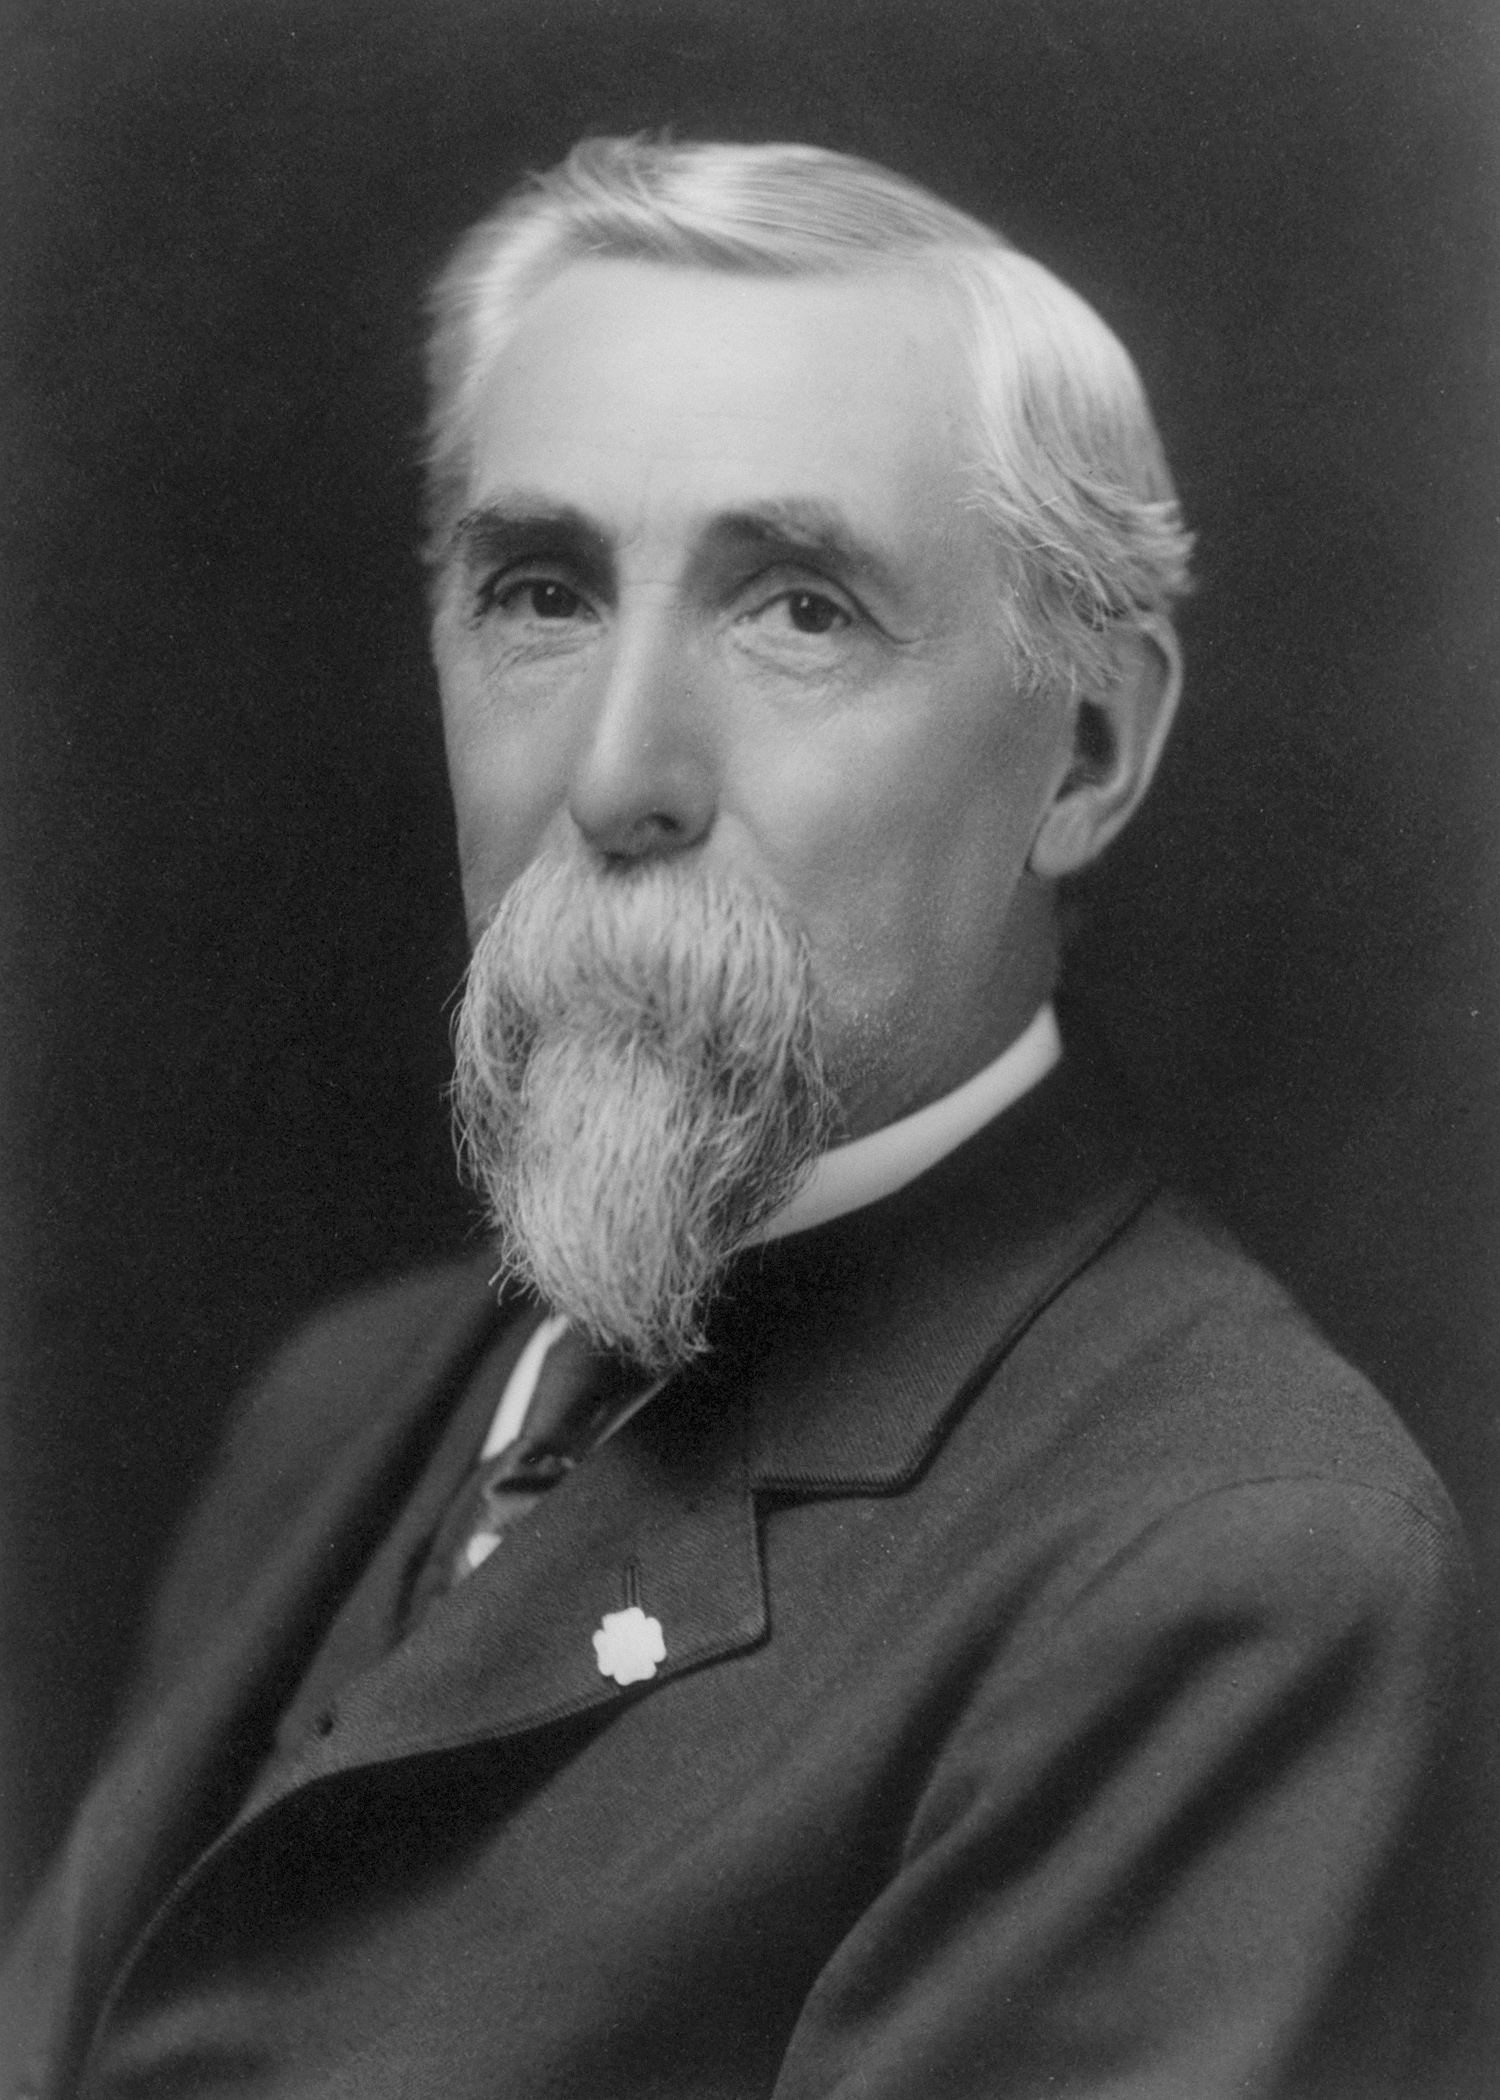 Henry Leland portrait